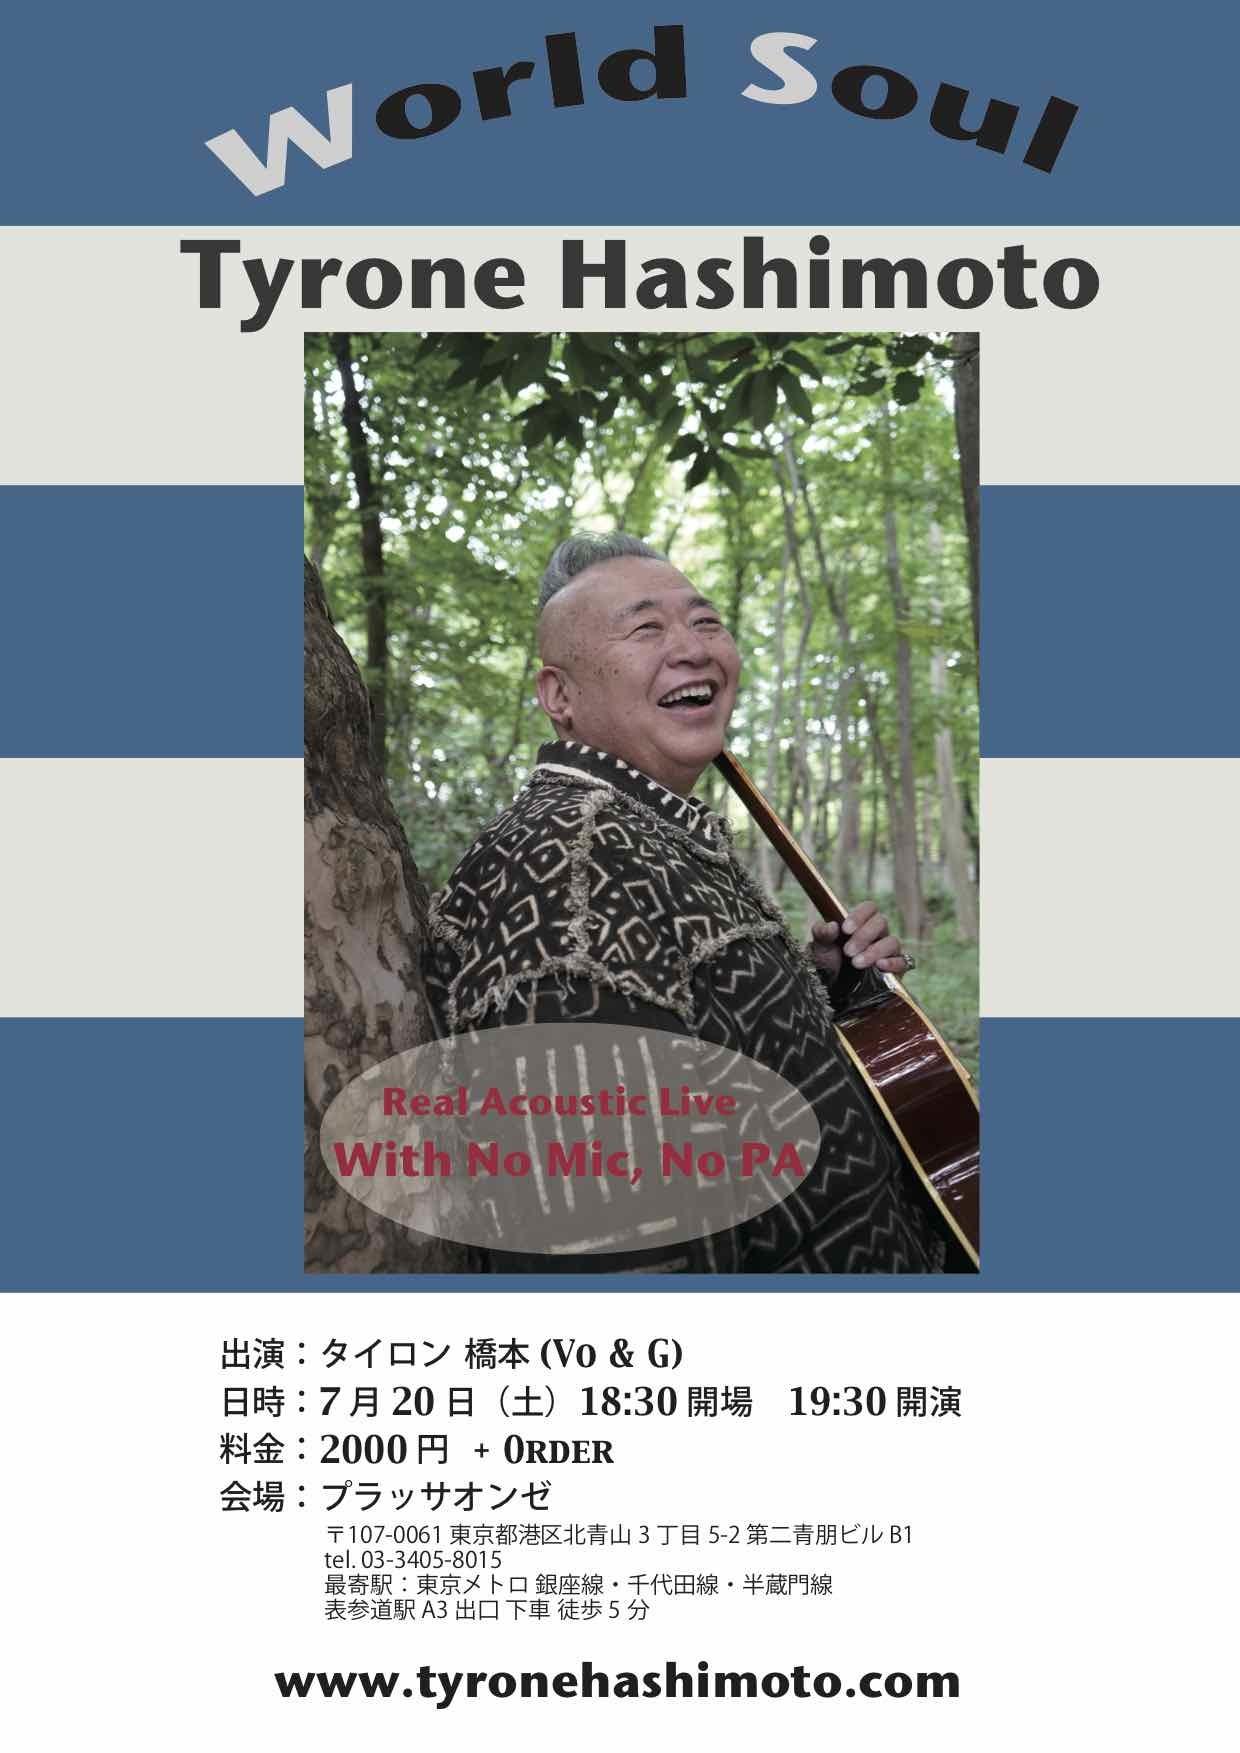 Tyrone Hashimoto 7月 ライブ情報_c0368808_15415950.jpg